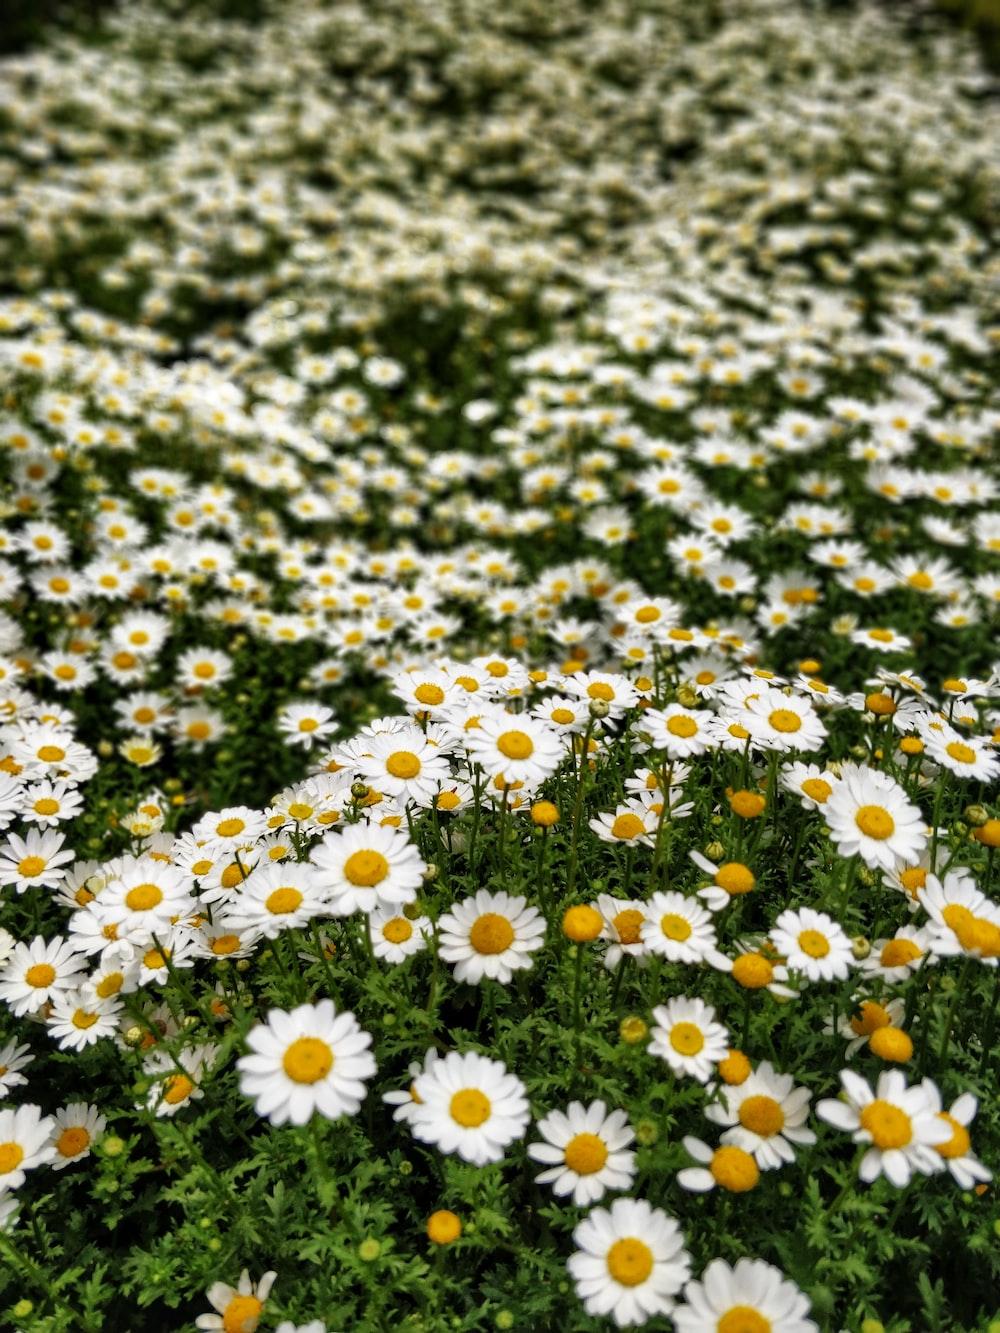 white daisy flower field at daytime